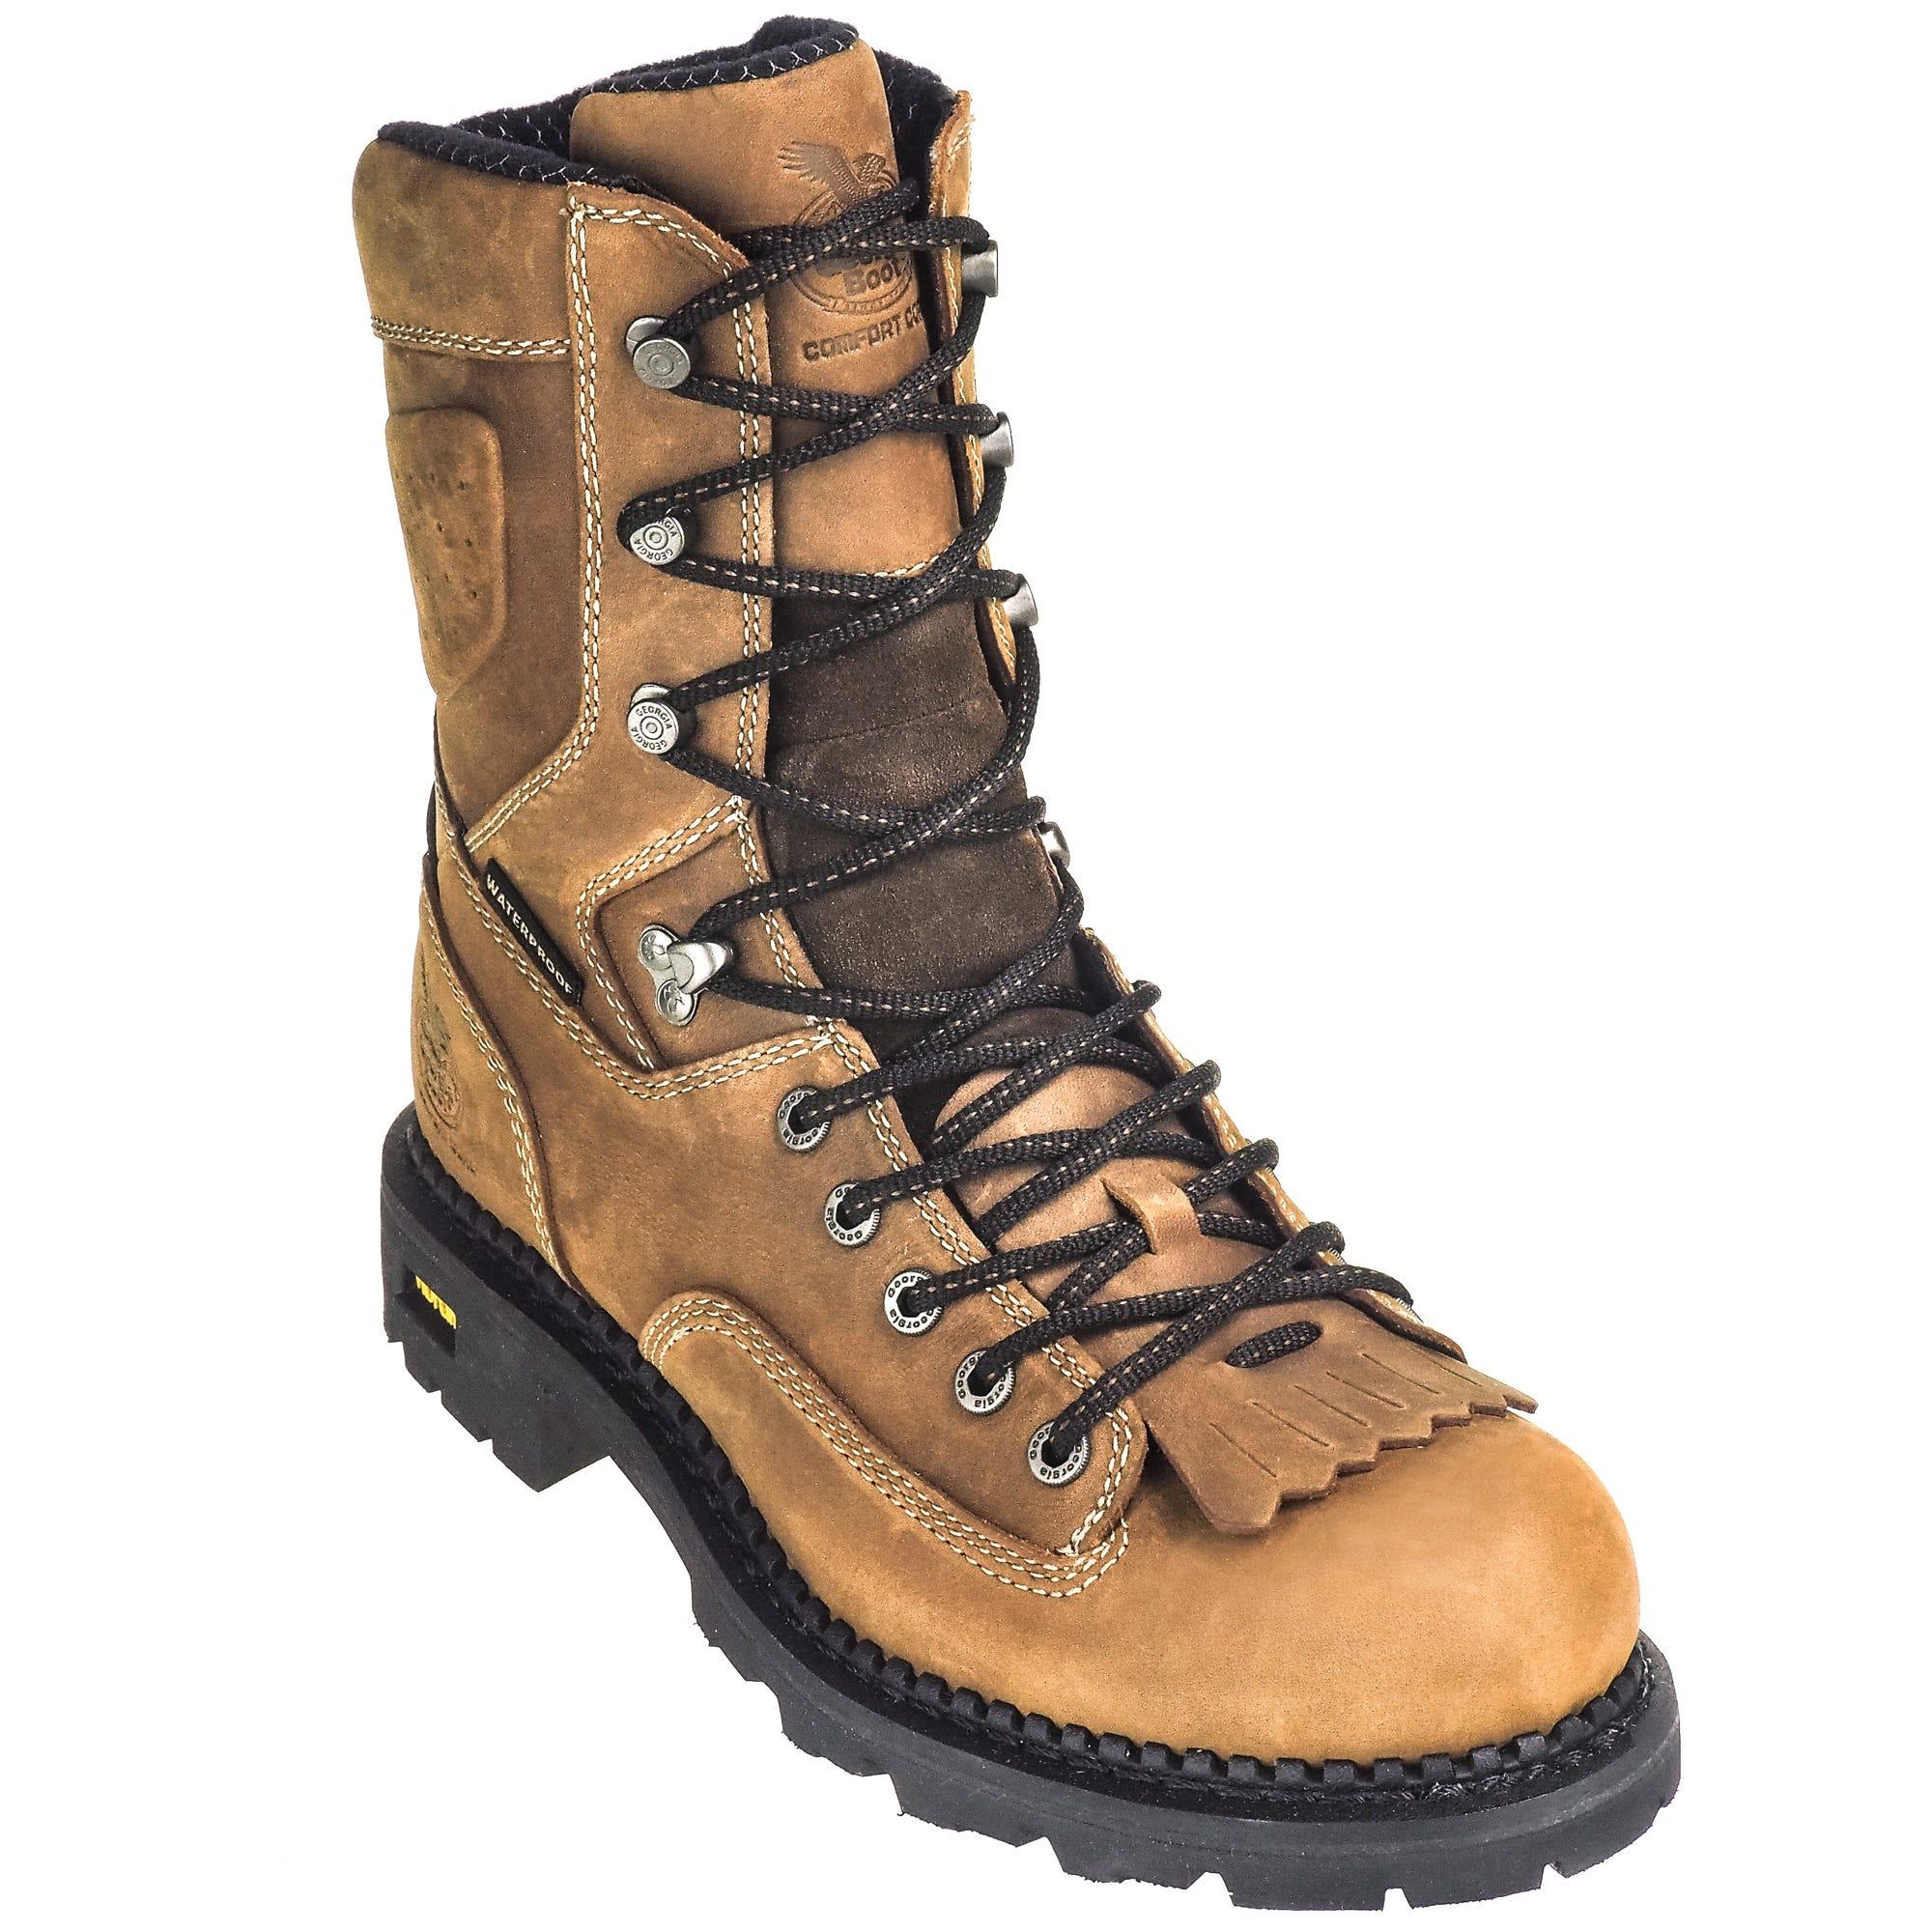 abb9ab46d25 Georgia Boots: Waterproof Men's Composite Toe Brown EH GB00123 8 ...